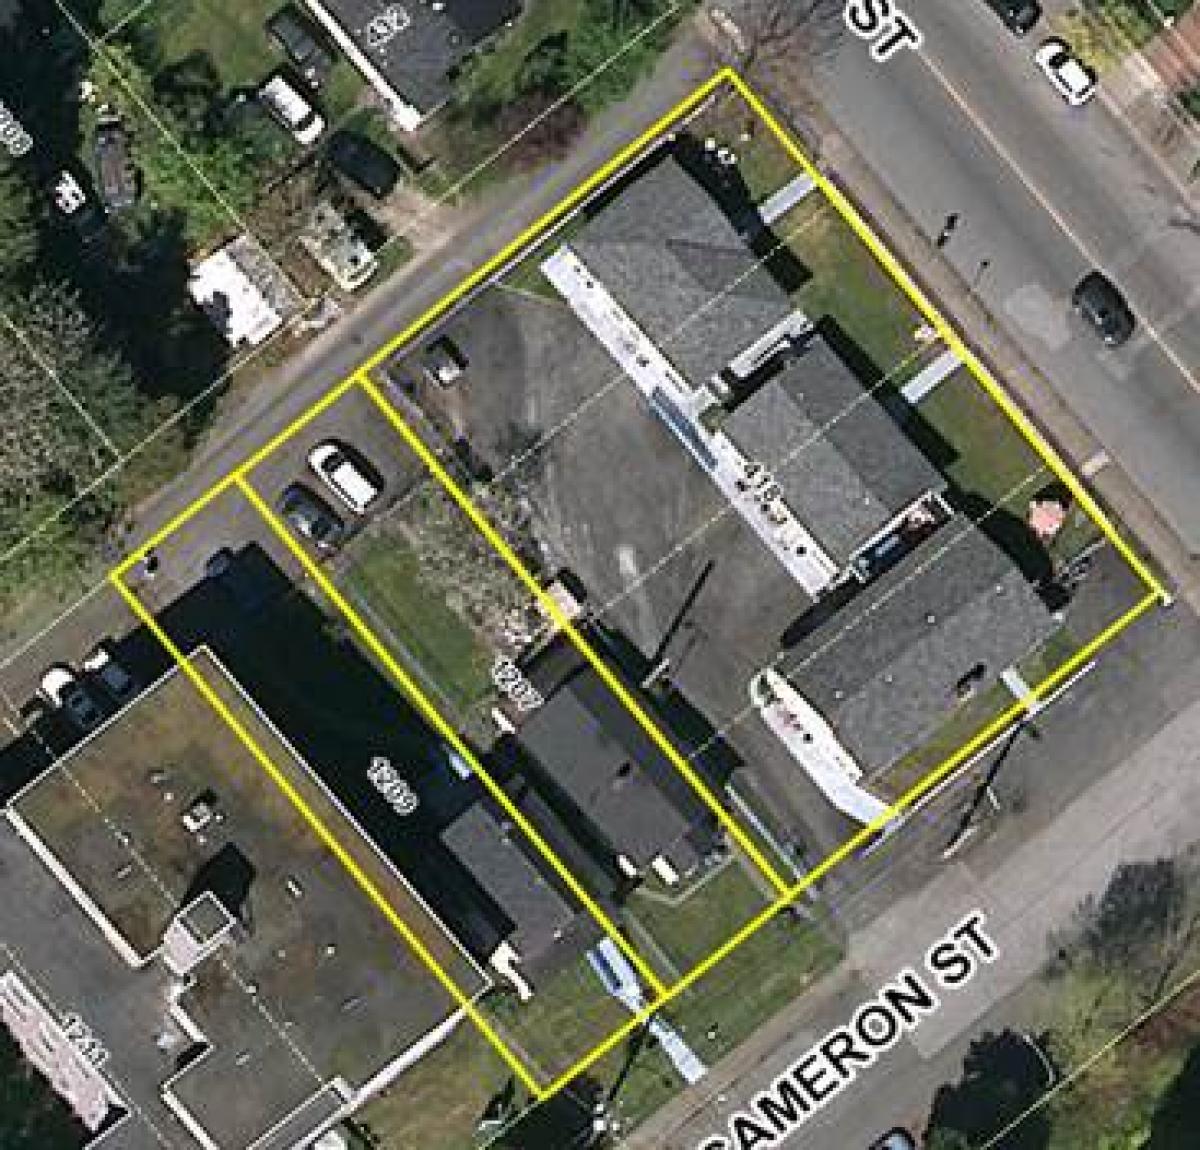 Picture of Development Site For Sale in Vancouver, British Columbia, Canada